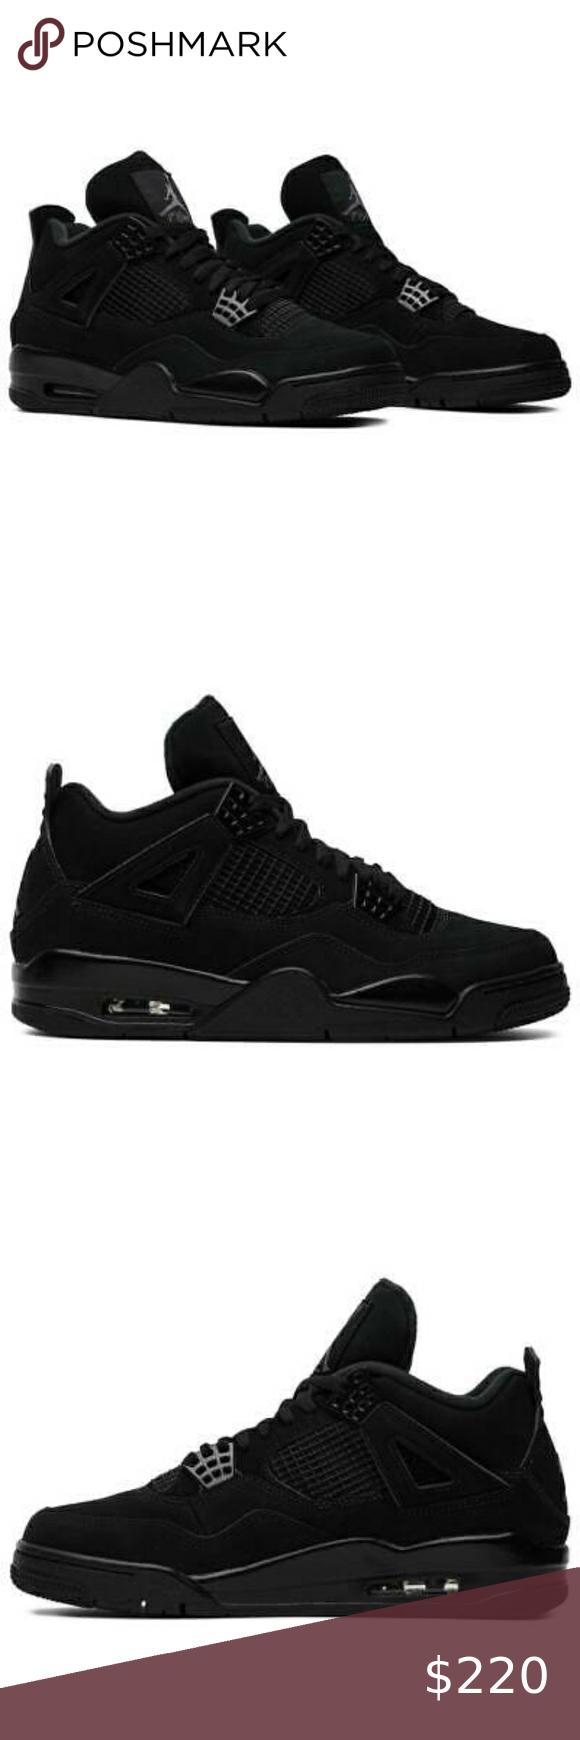 Nike Air Jordan 4 Retro 'Black Cat' 2020 Authentic NWT in